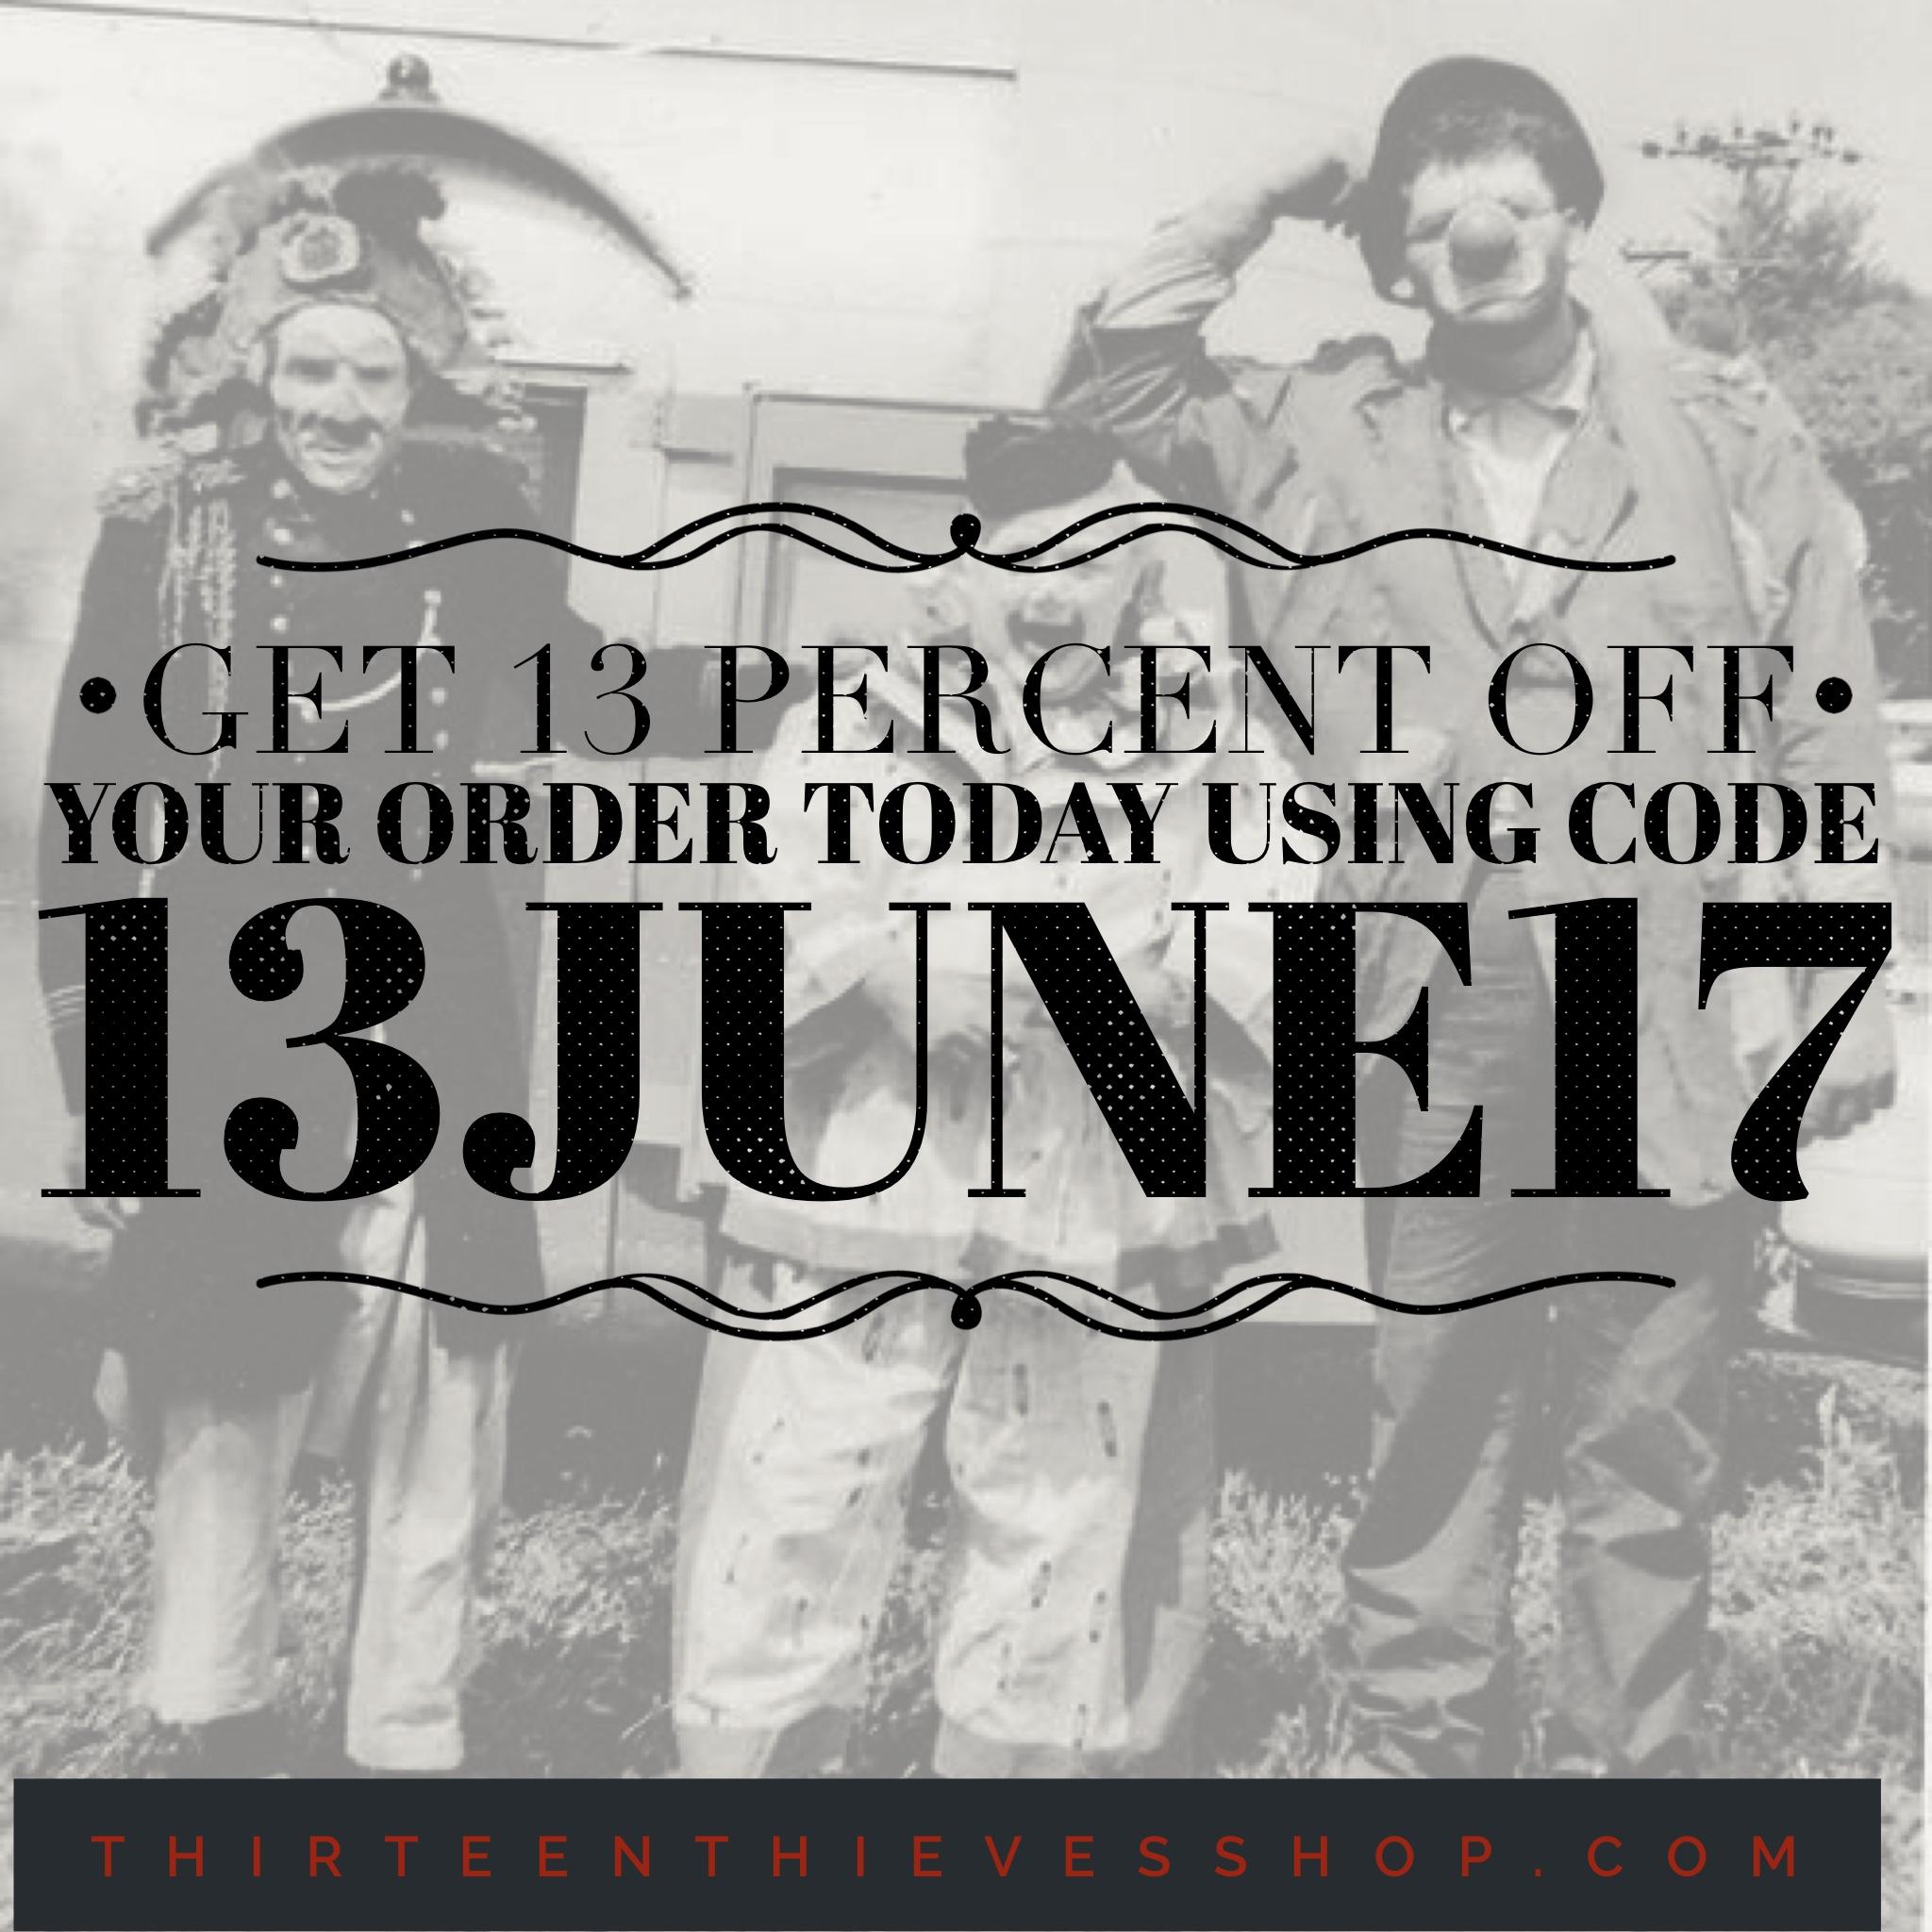 June 13 Sale